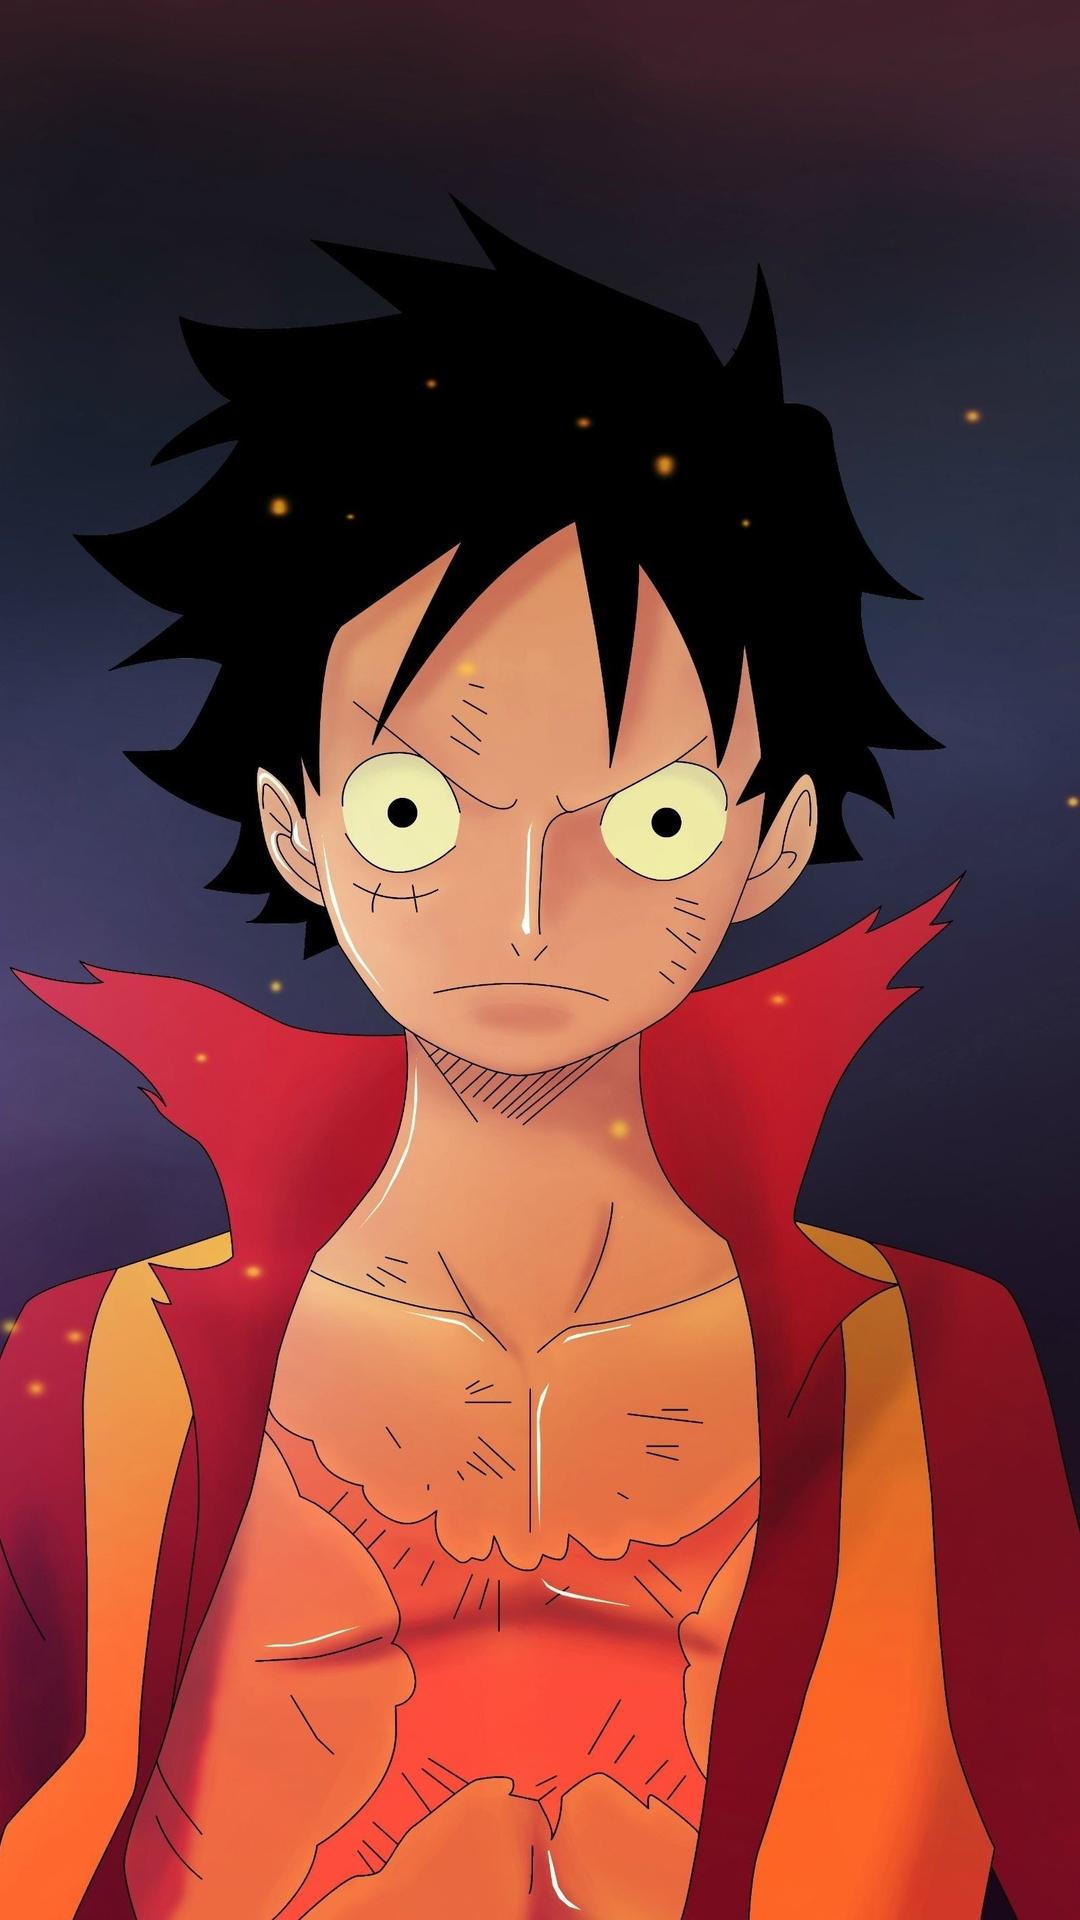 Monkey D Luffy One Piece 4k Ln